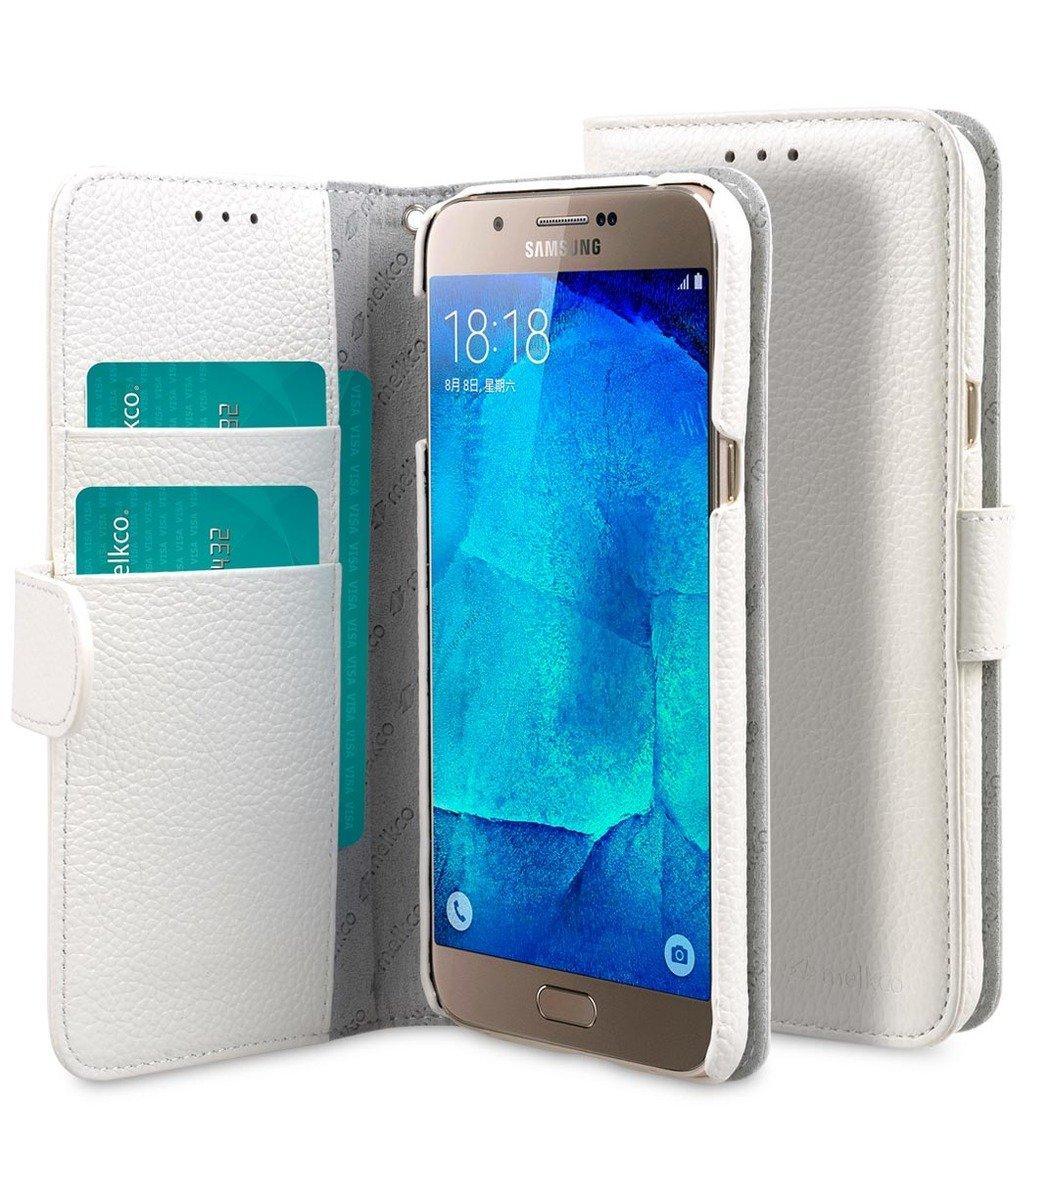 Samsung Galaxy A8 Wallet Book Type 高級真皮革手機套 - 白色荔枝紋